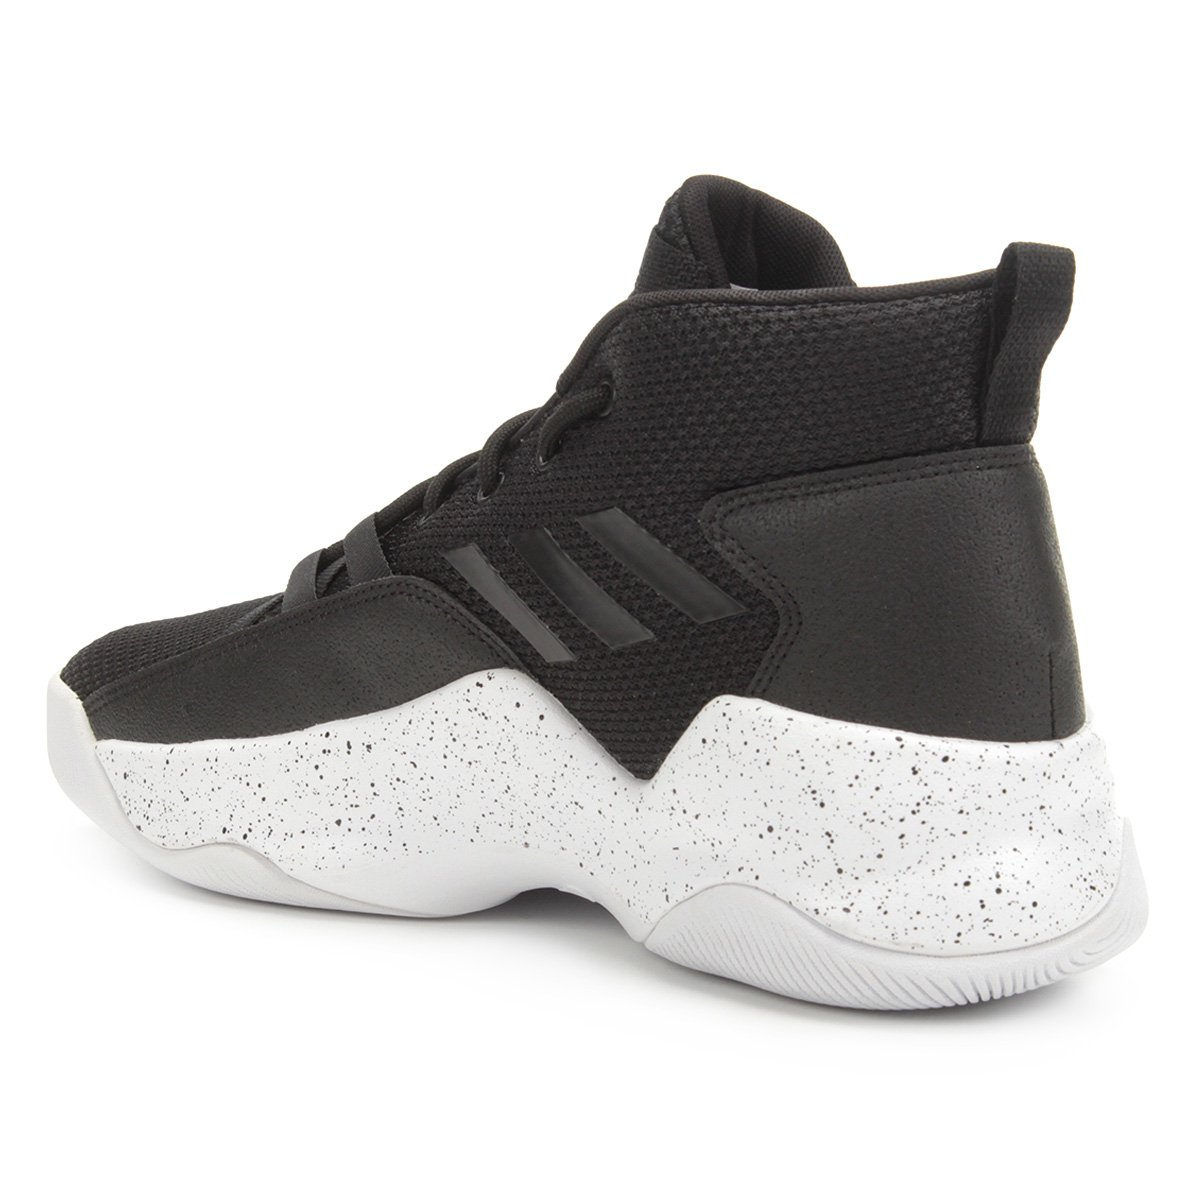 Tênis Adidas Concrete Adt Masculino  Tênis Adidas Concrete Adt Masculino ... 7725e0354fc79